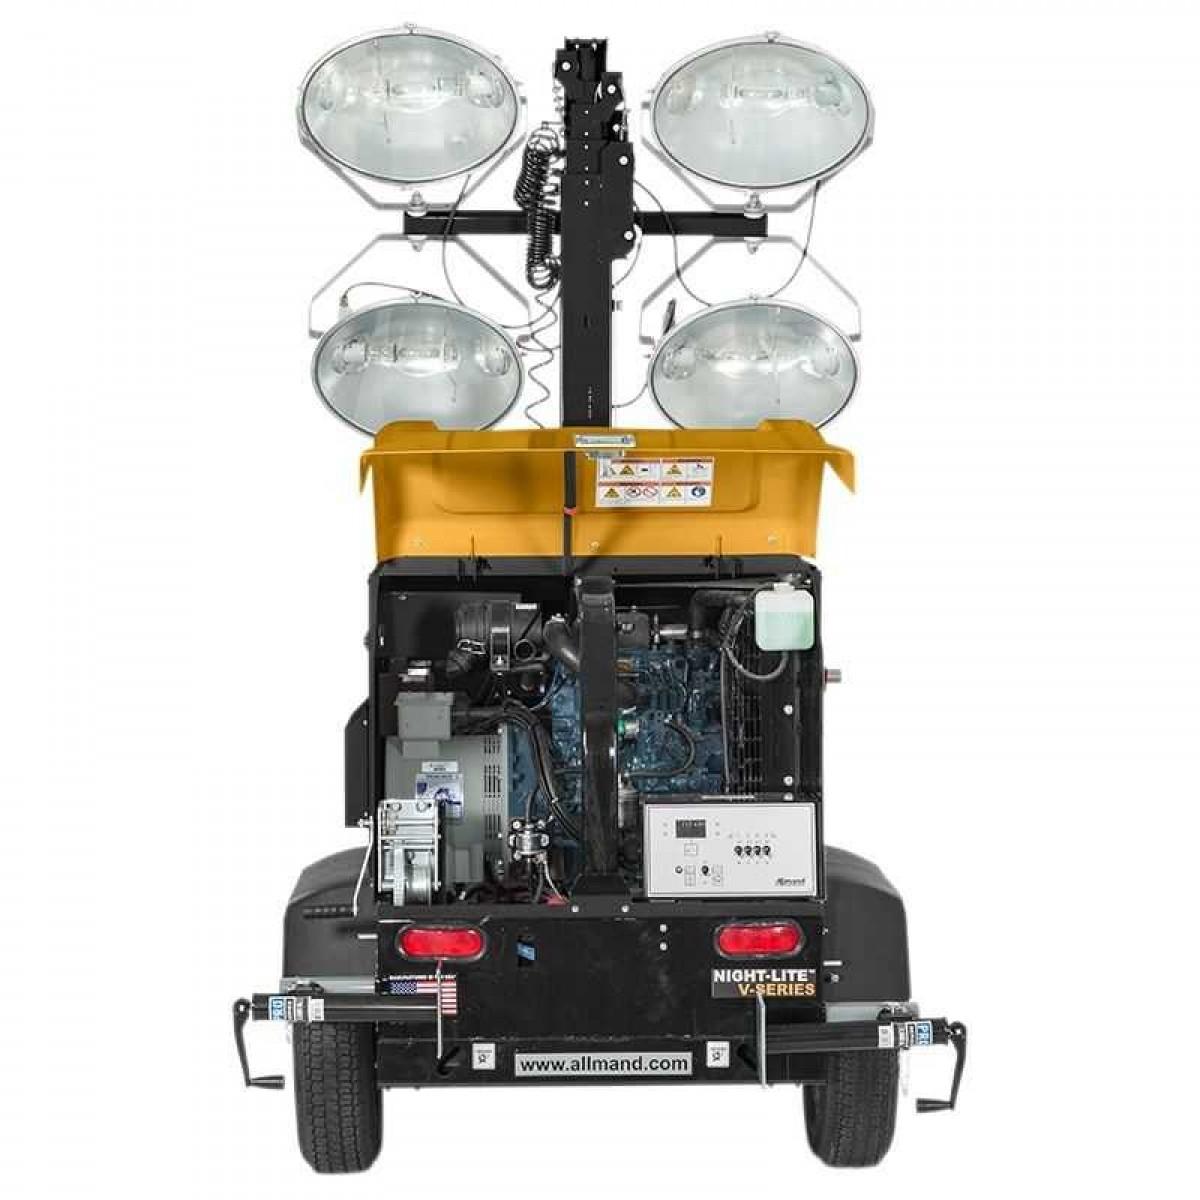 Allmand Night-Lite V Series Light Tower